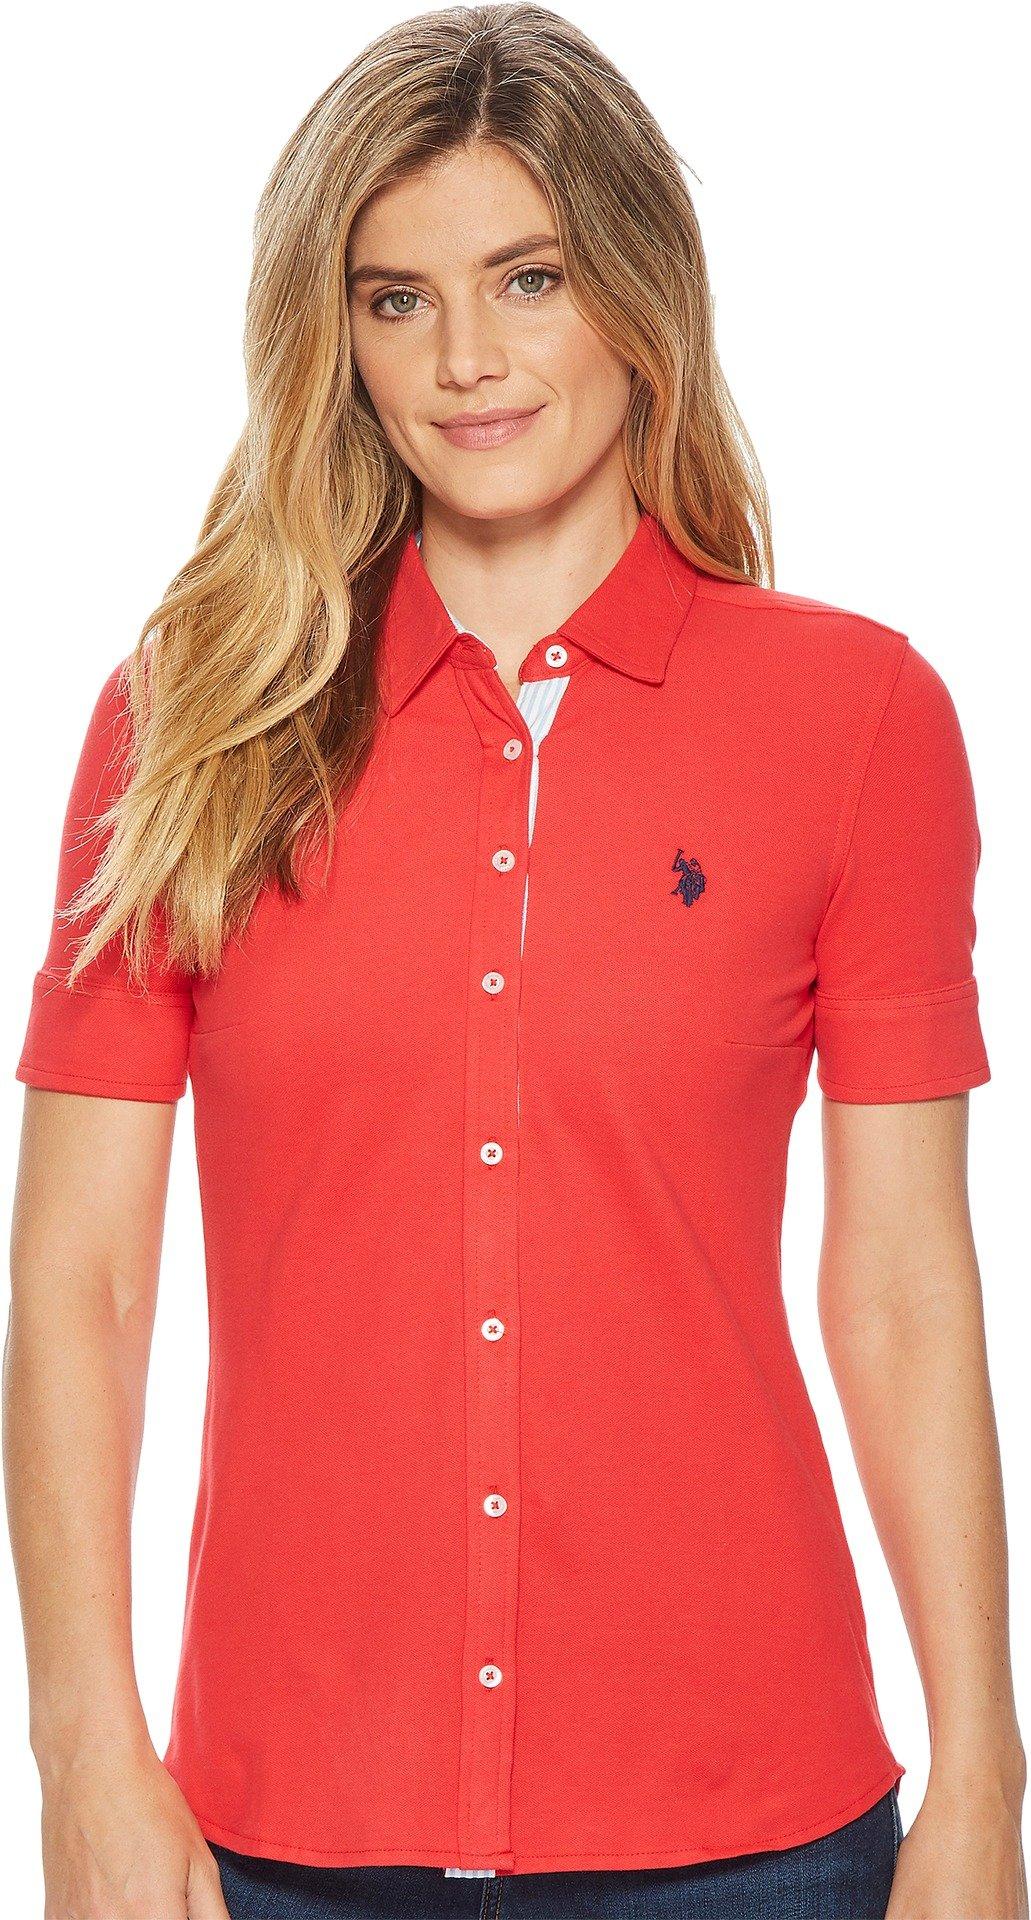 U.S. Polo Assn.. Women's Short Sleeve Fashion Blouse, Lollipop-Pique-Fhbb, L